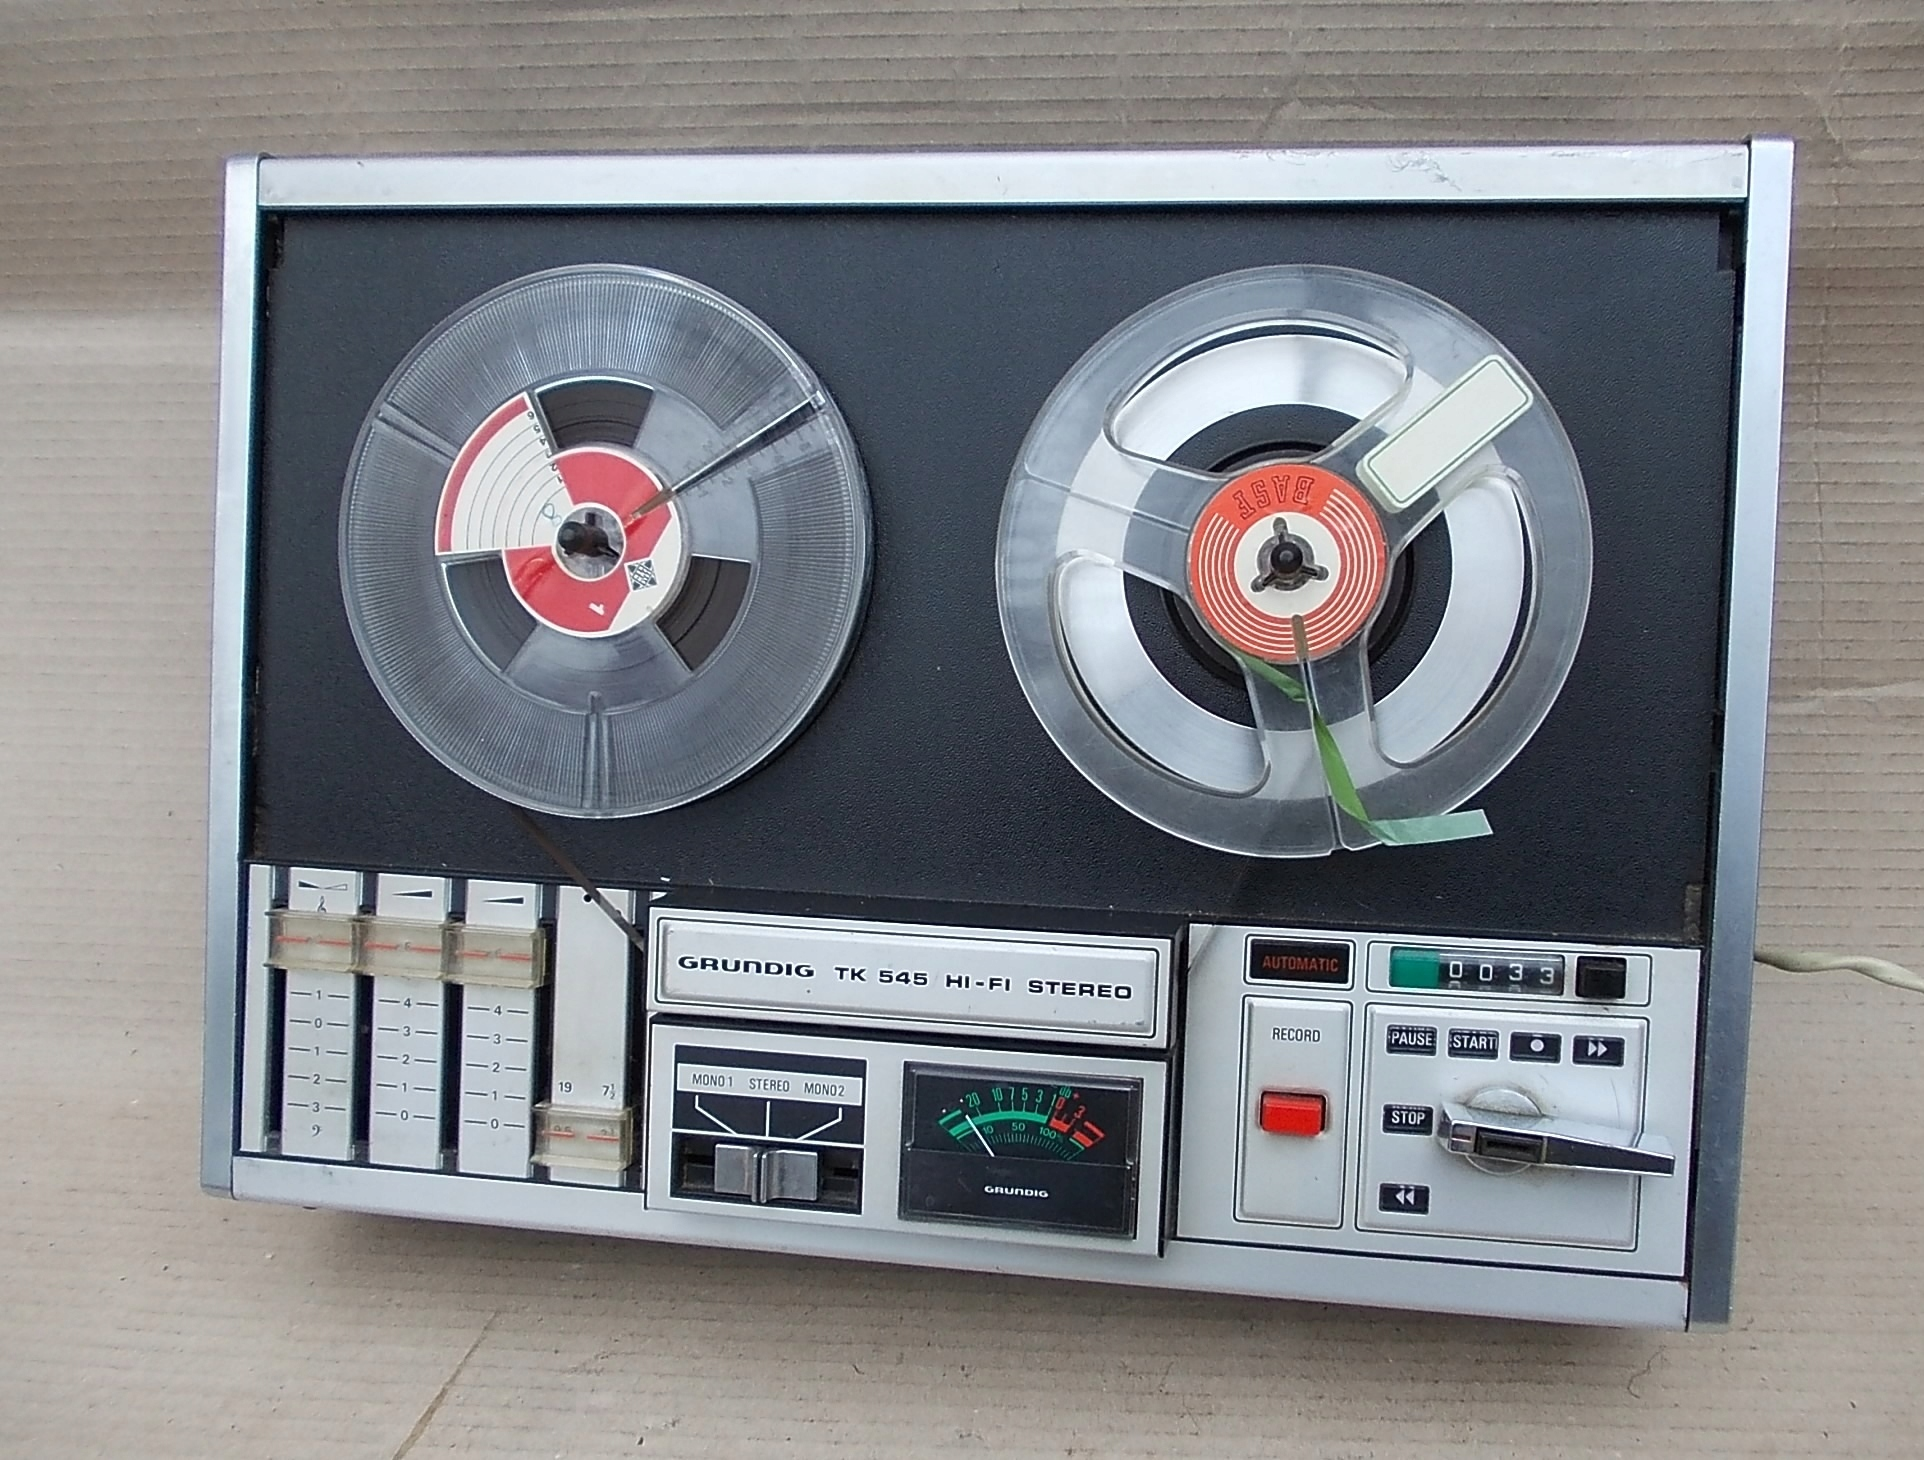 GRUNDIG TK 545 HI-FI stereo magnetofon szpulowy